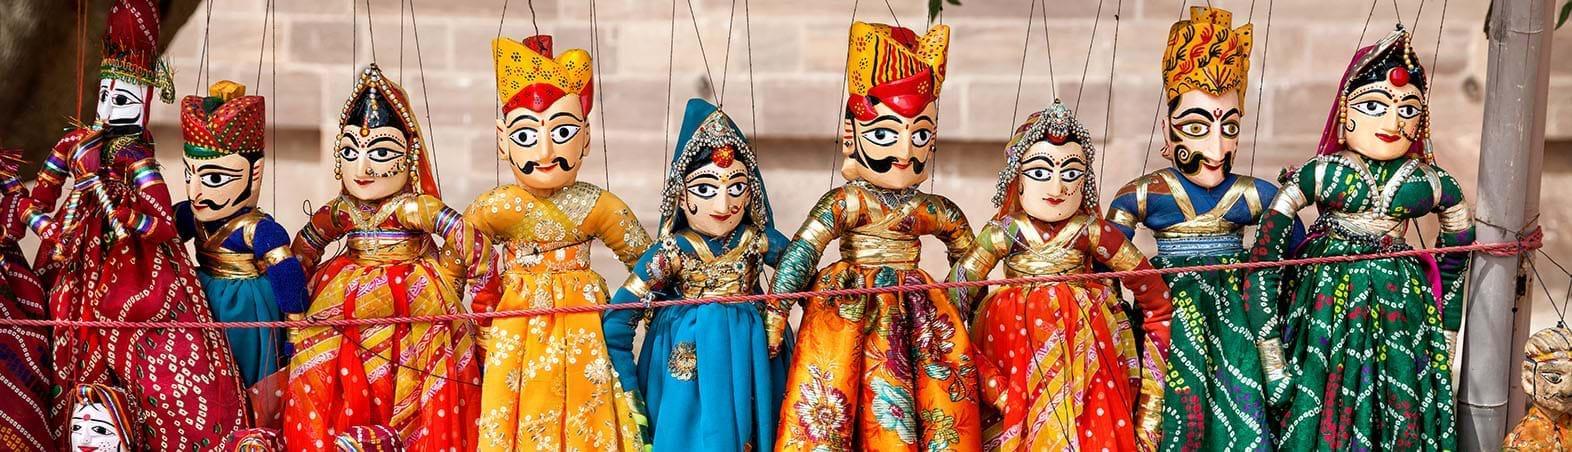 Enjoy a Cultural trip to Jaipur – the Pink City that Appreciates Art